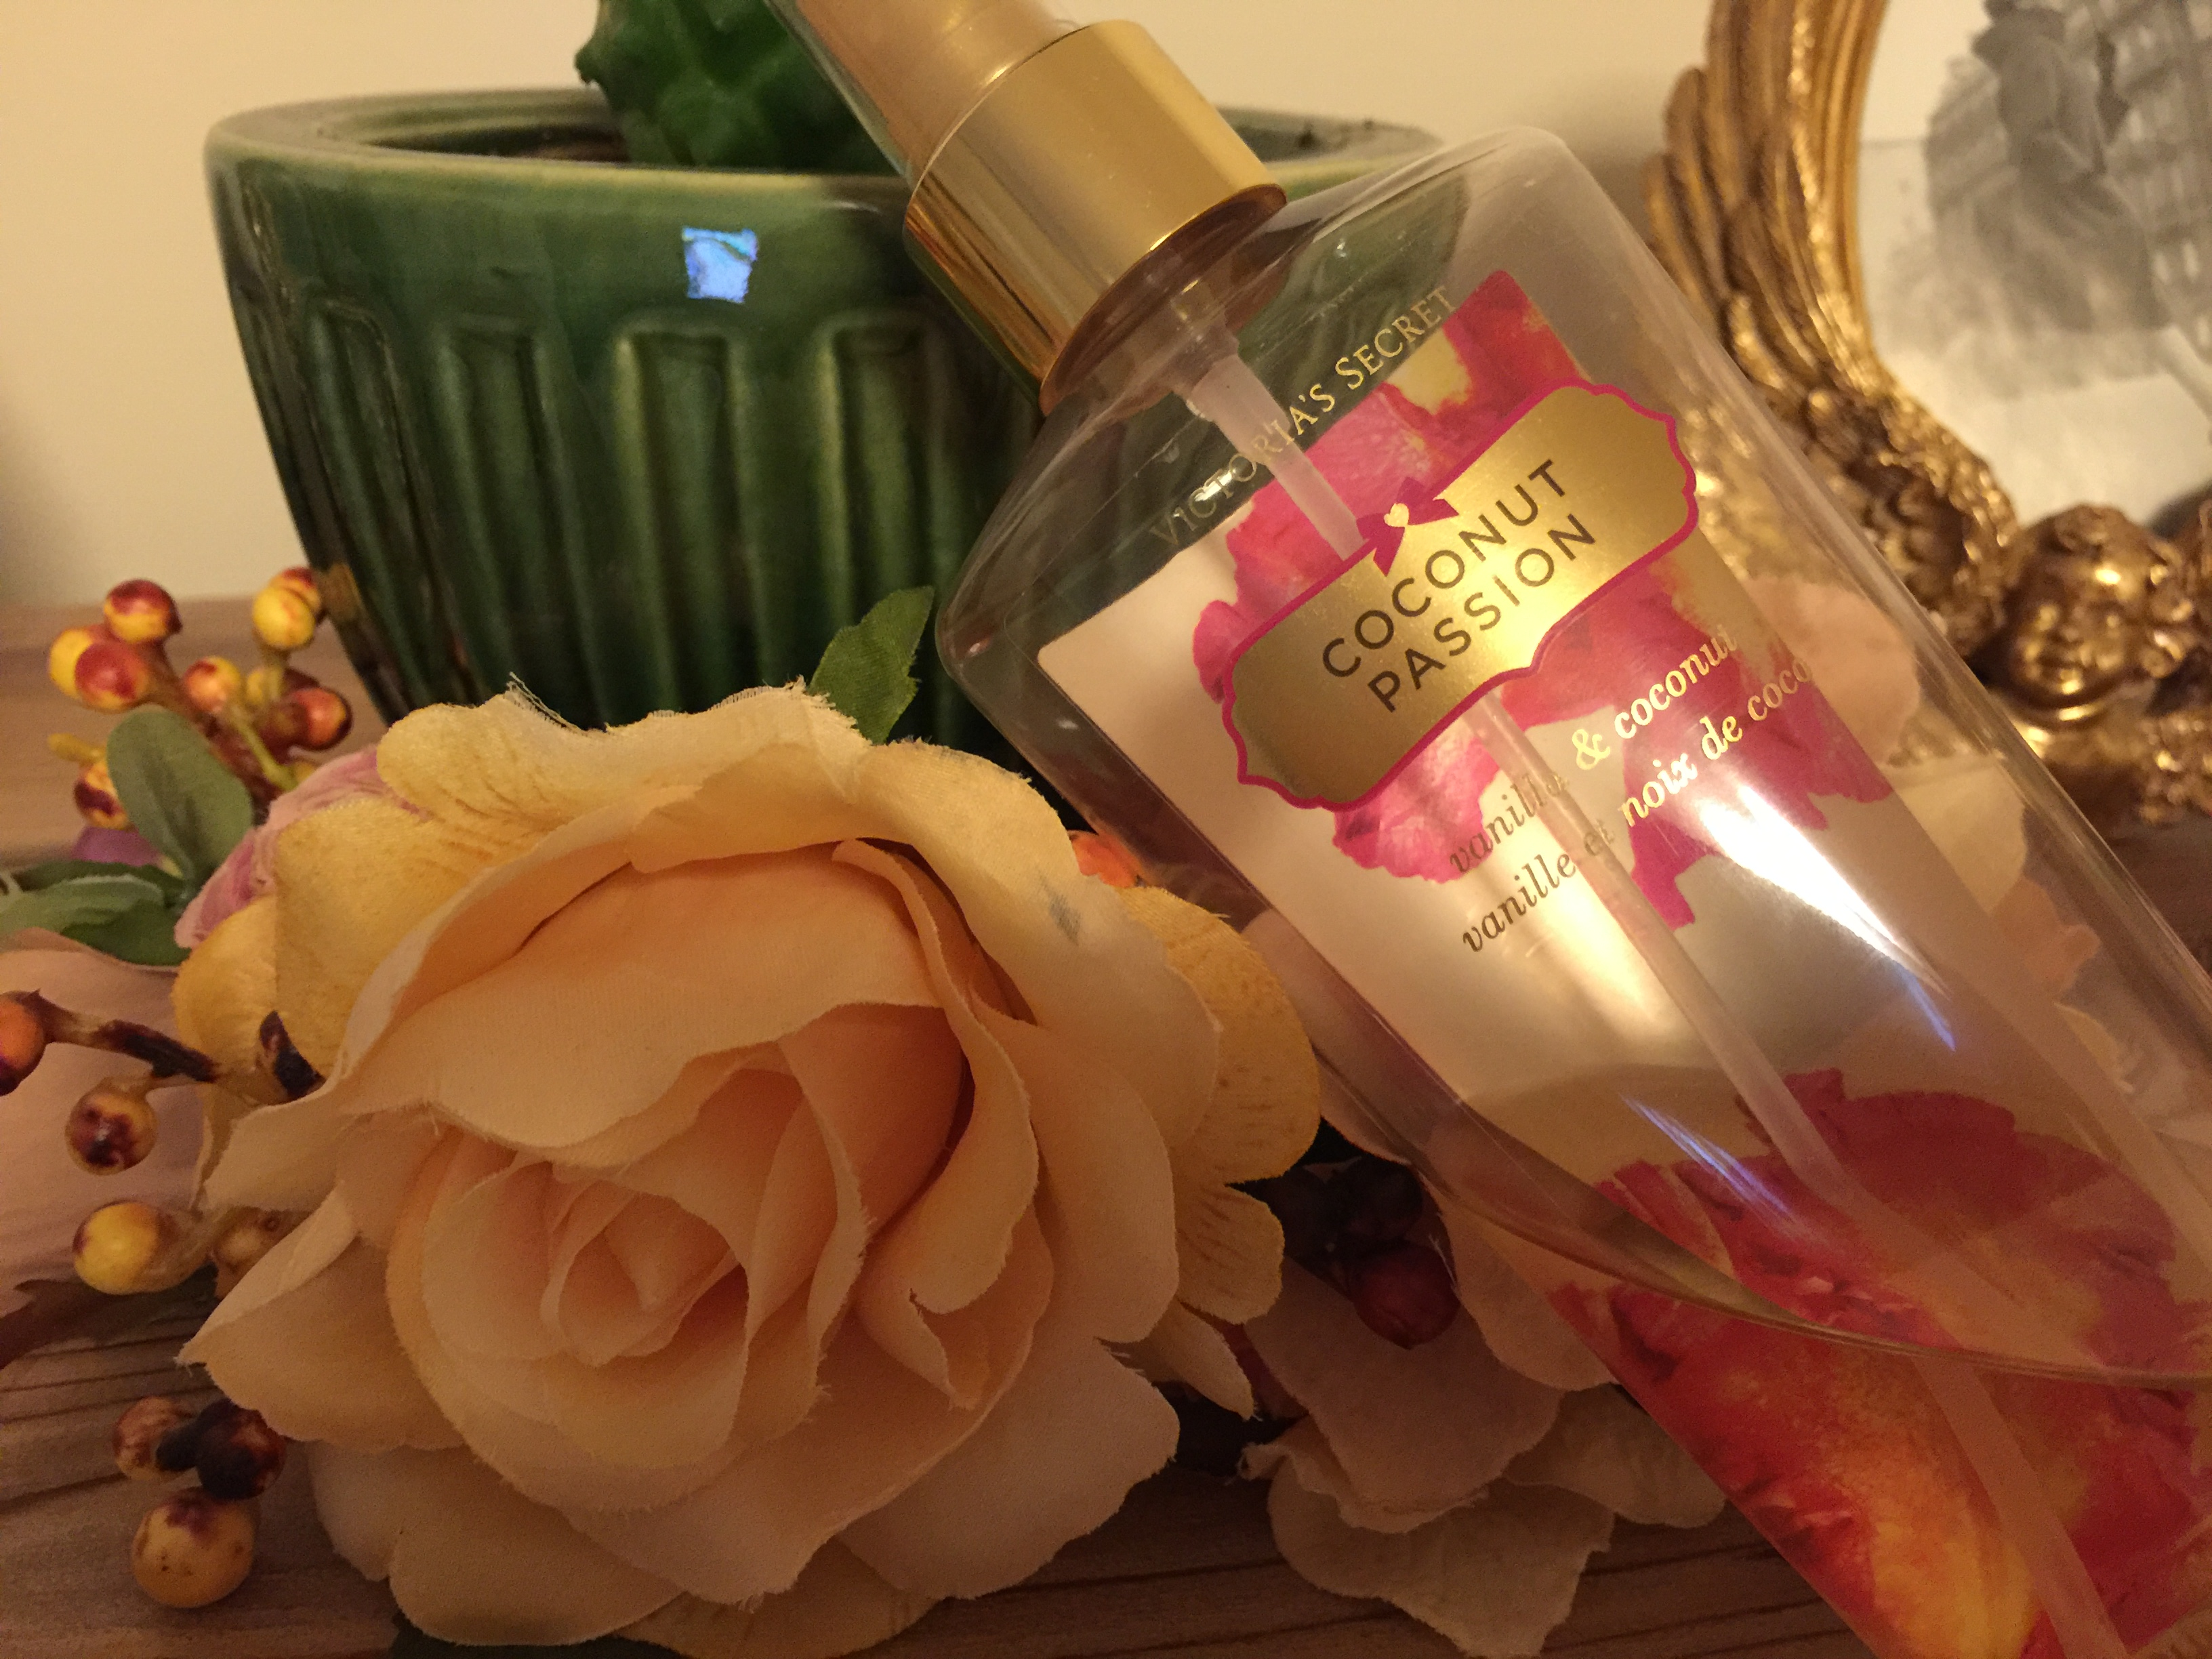 Victoria's Secret – Coconut Passion Vücut Spreyi